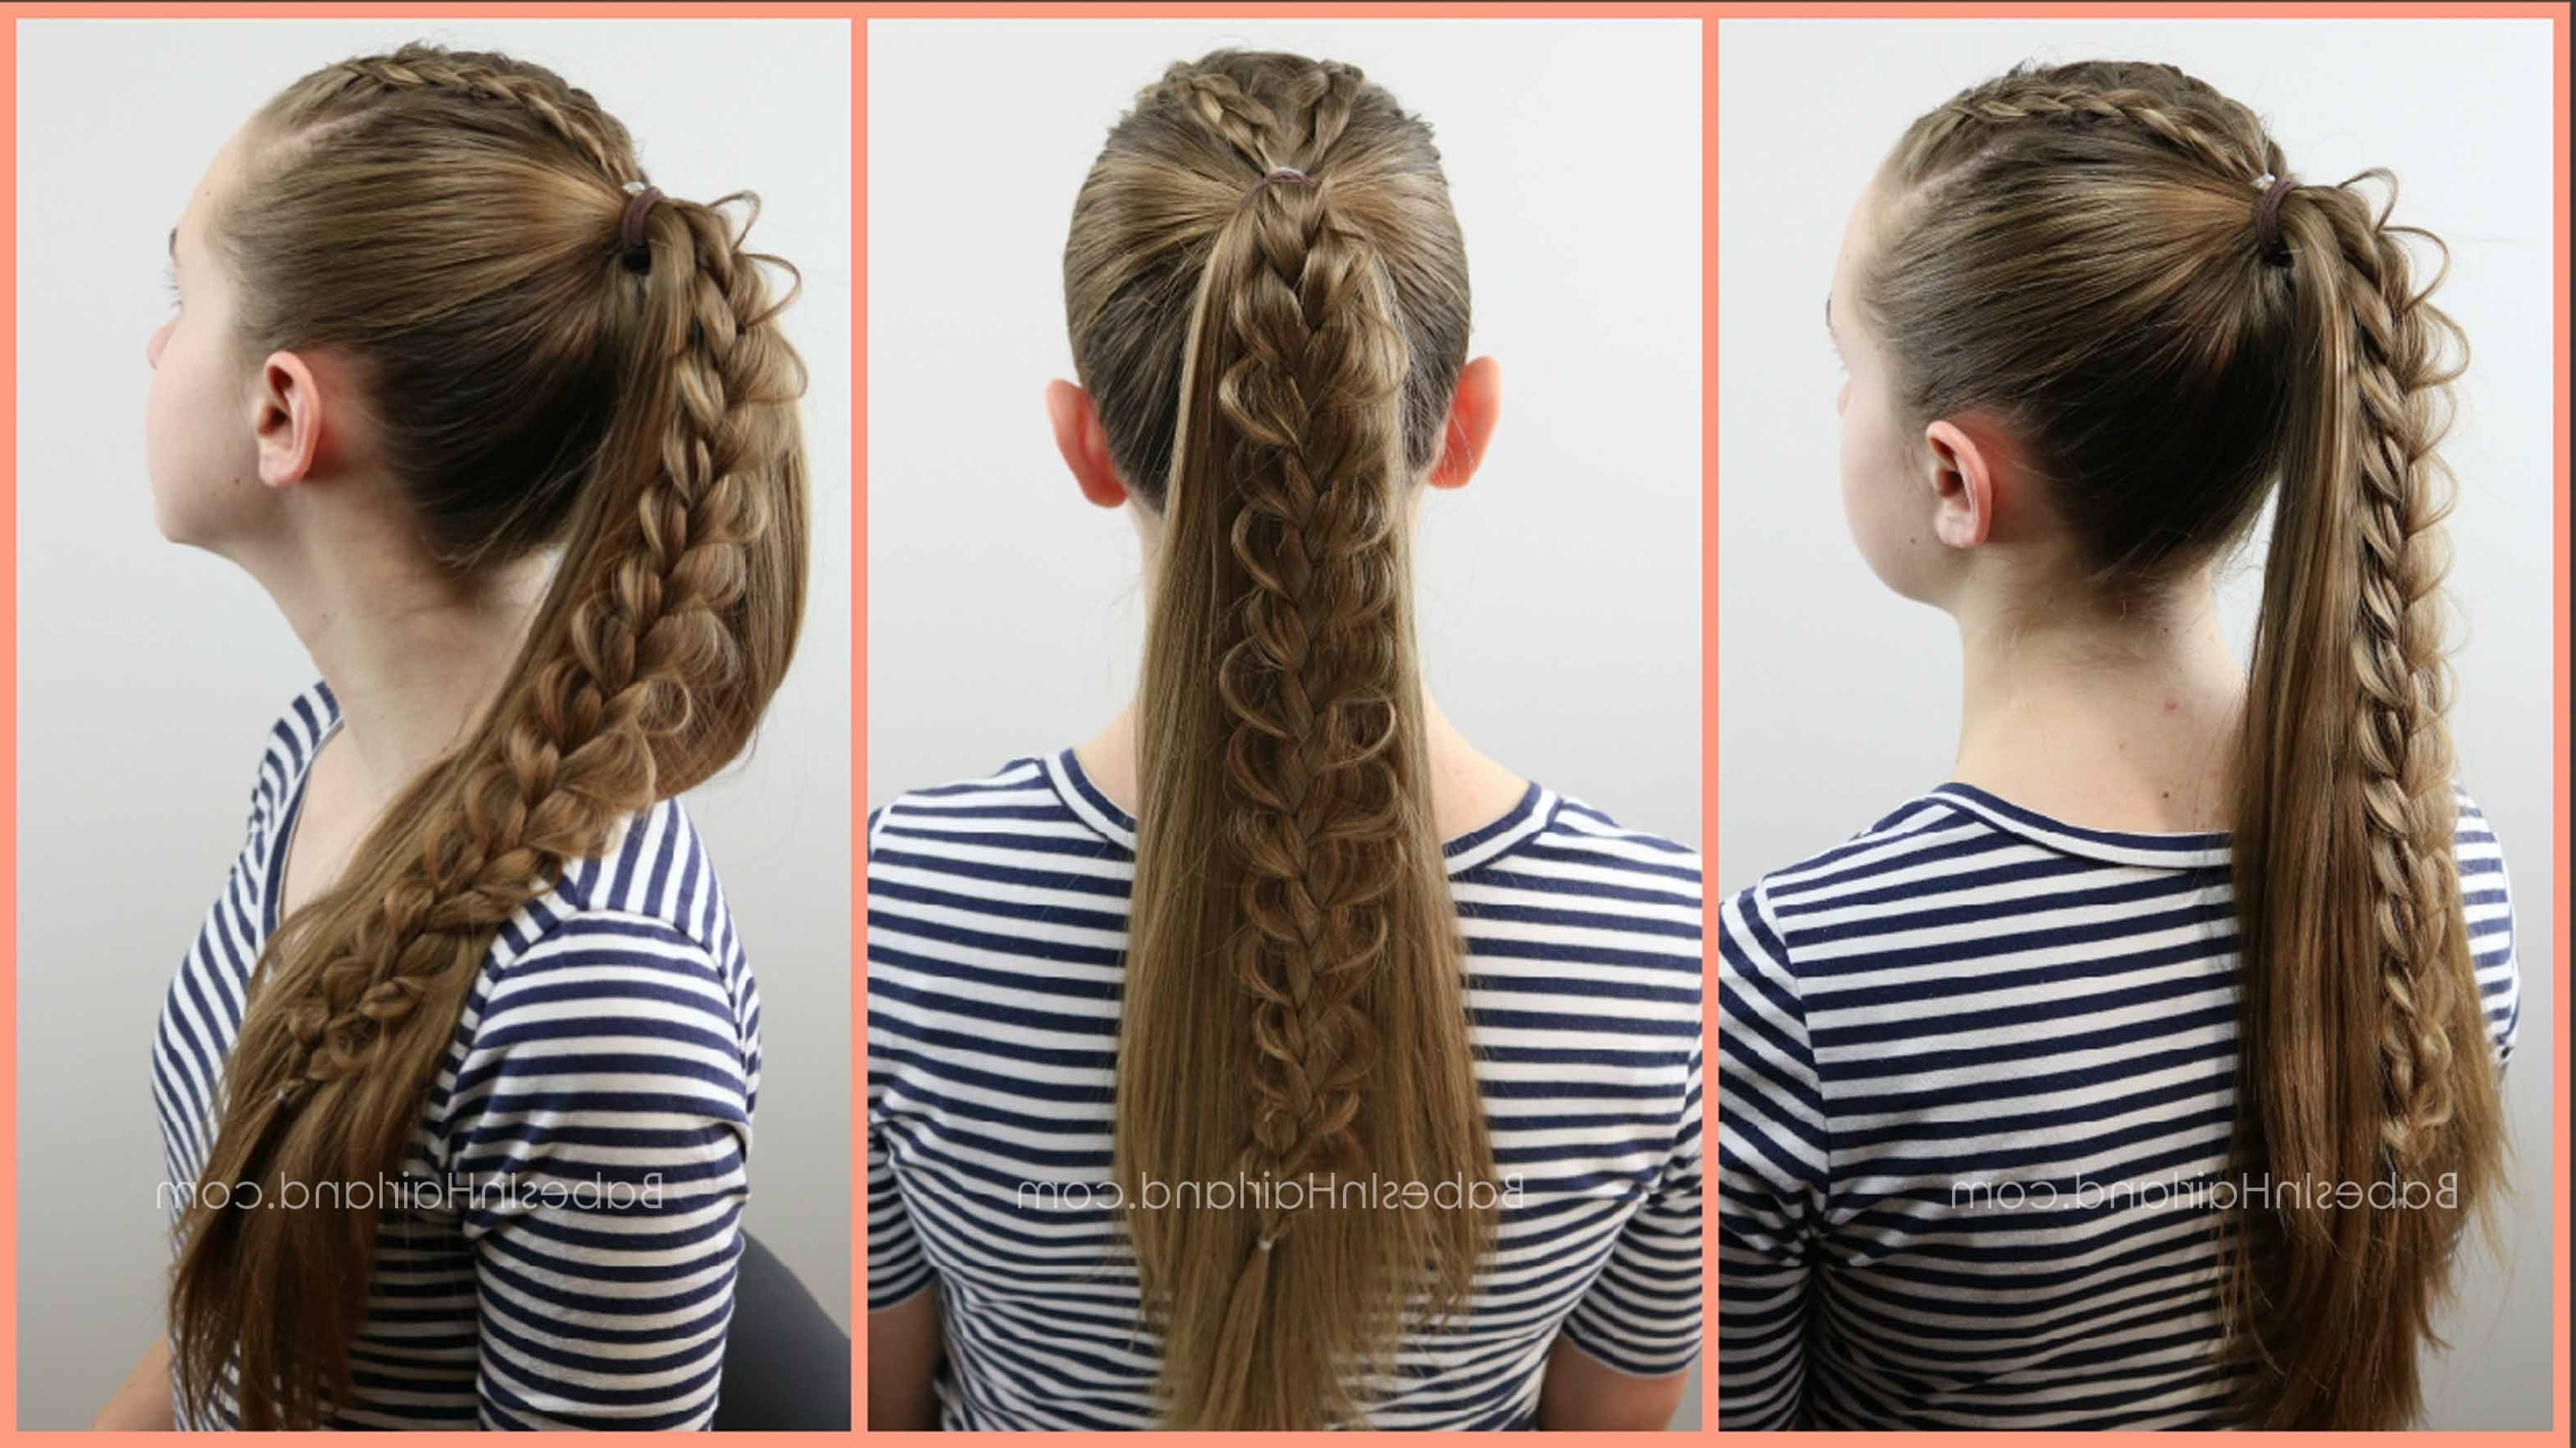 2 Dutch Braids 5 Different Hairstyles (View 1 of 20)